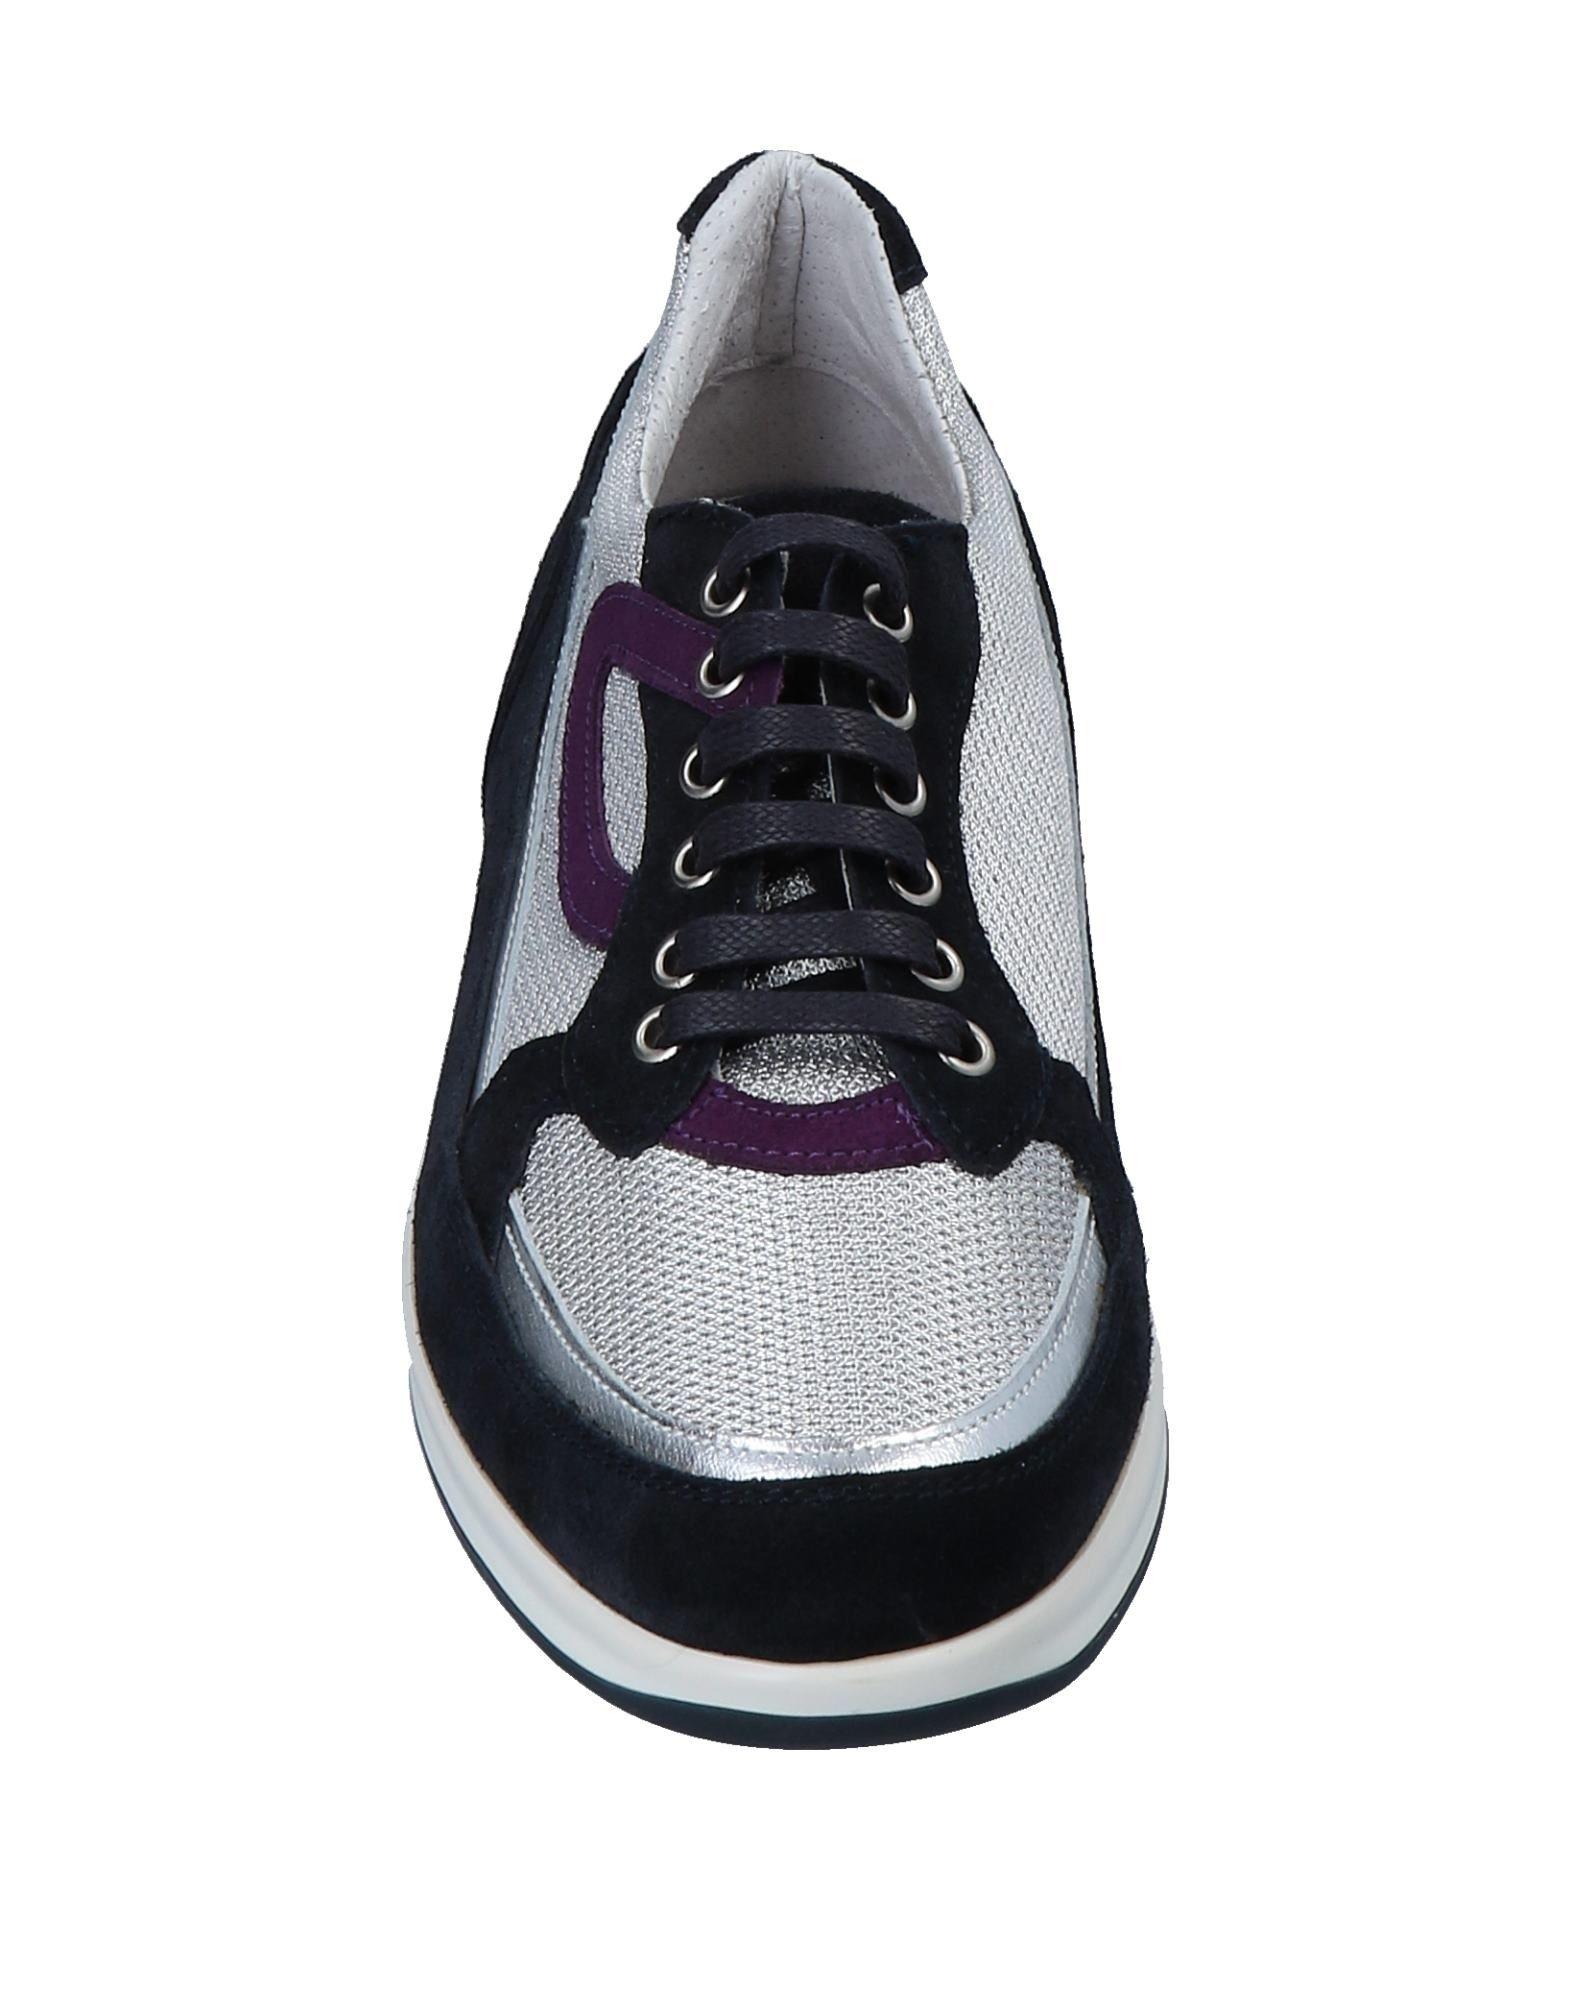 Salvo Barone Sneakers - Men Salvo Barone Australia Sneakers online on  Australia Barone - 11556949VK c67691